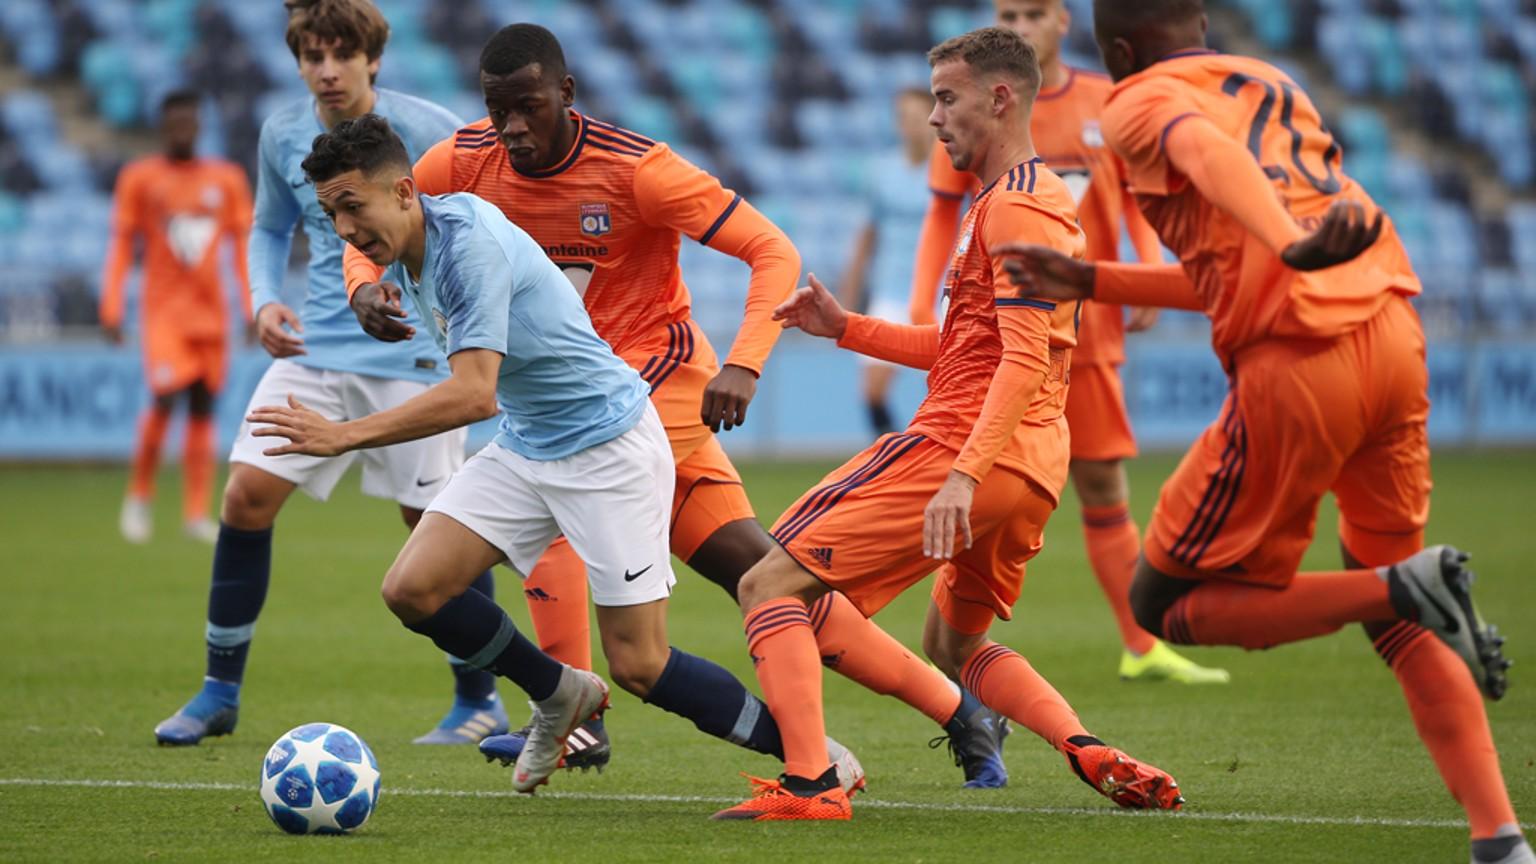 ACTION SHOT: Ian Poveda bursts through the Lyon defence.